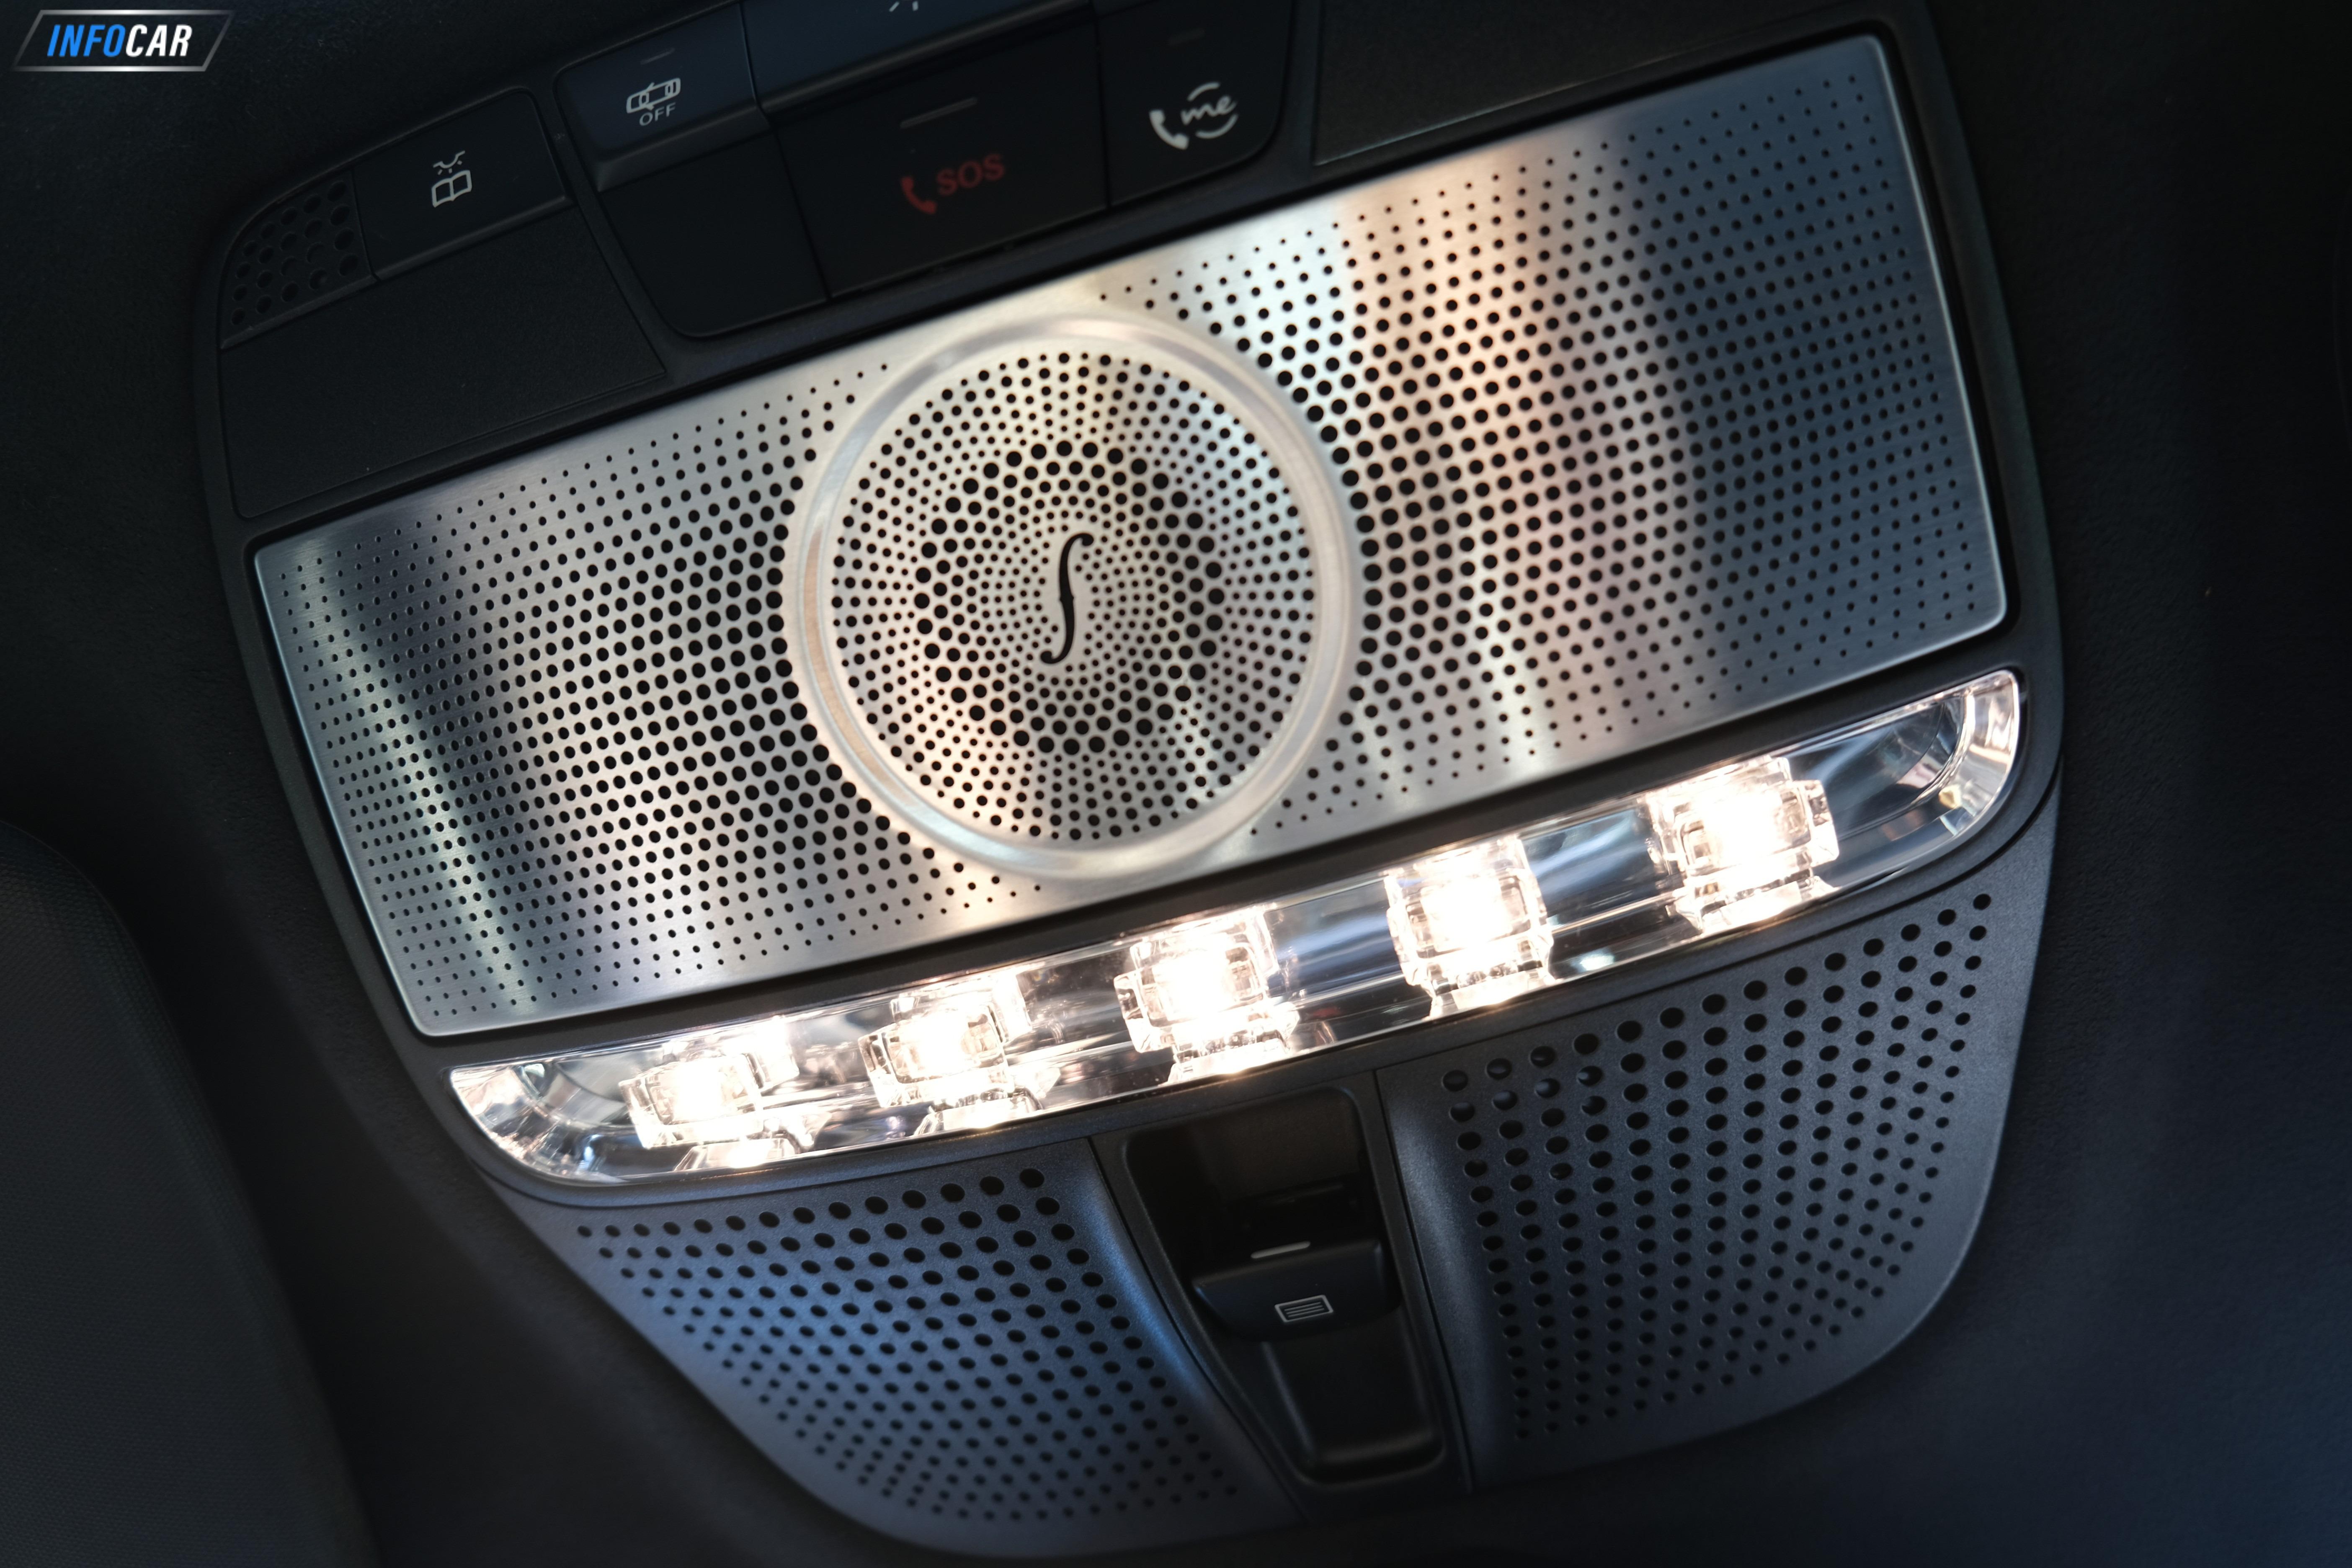 2019 Mercedes-Benz G-Class 63(包含5000押金) - INFOCAR - Toronto's Most Comprehensive New and Used Auto Trading Platform